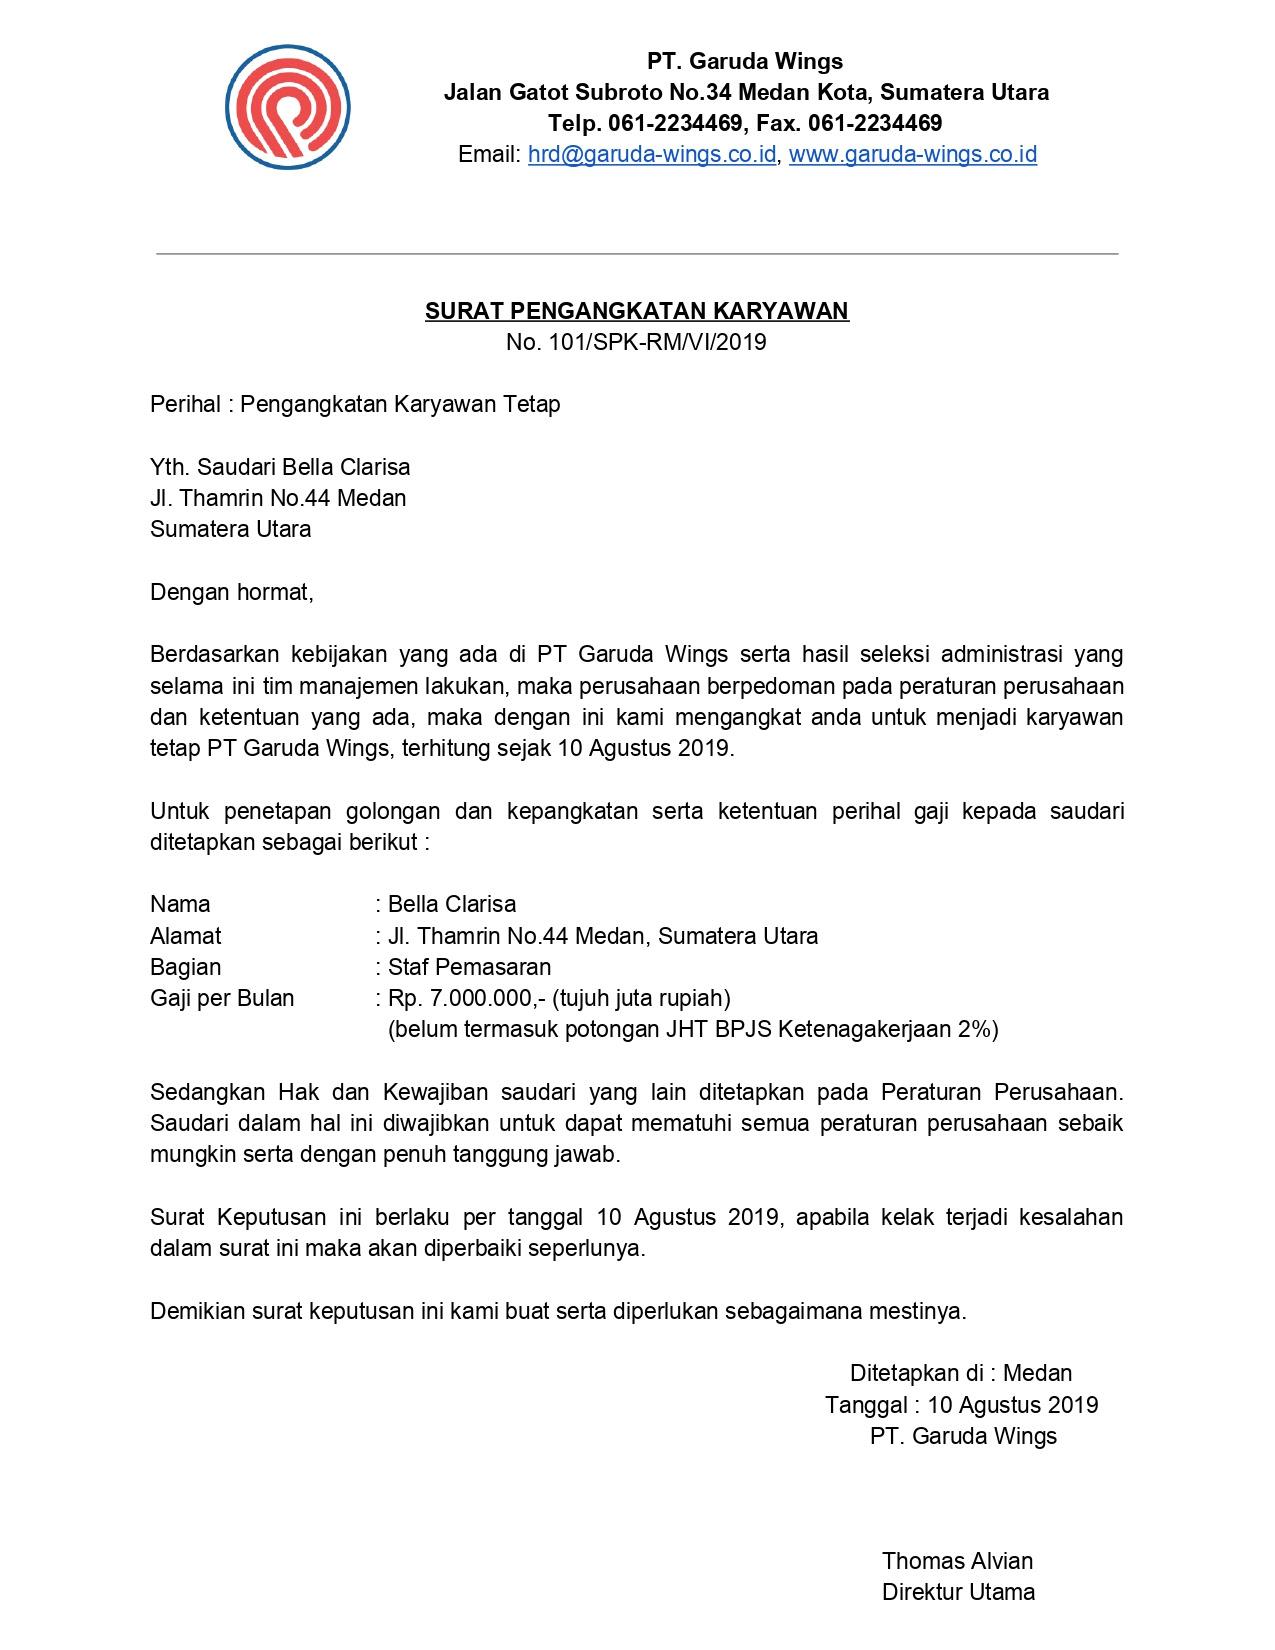 Contoh Surat Keterangan Karyawan Untuk Segala Keperluan ...